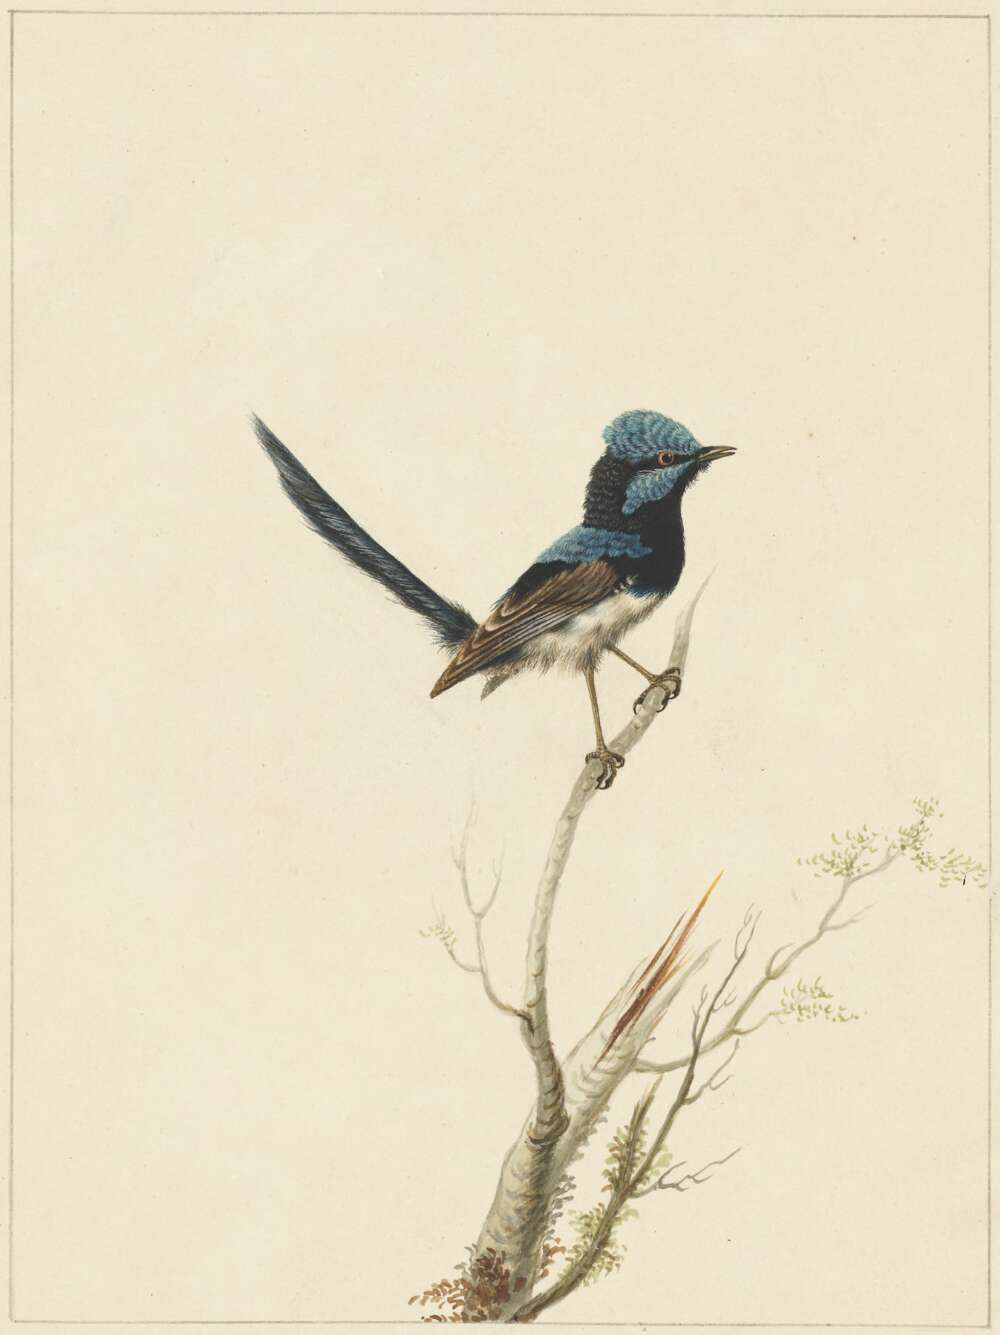 Sarah Stone, Superb warbler [1790]